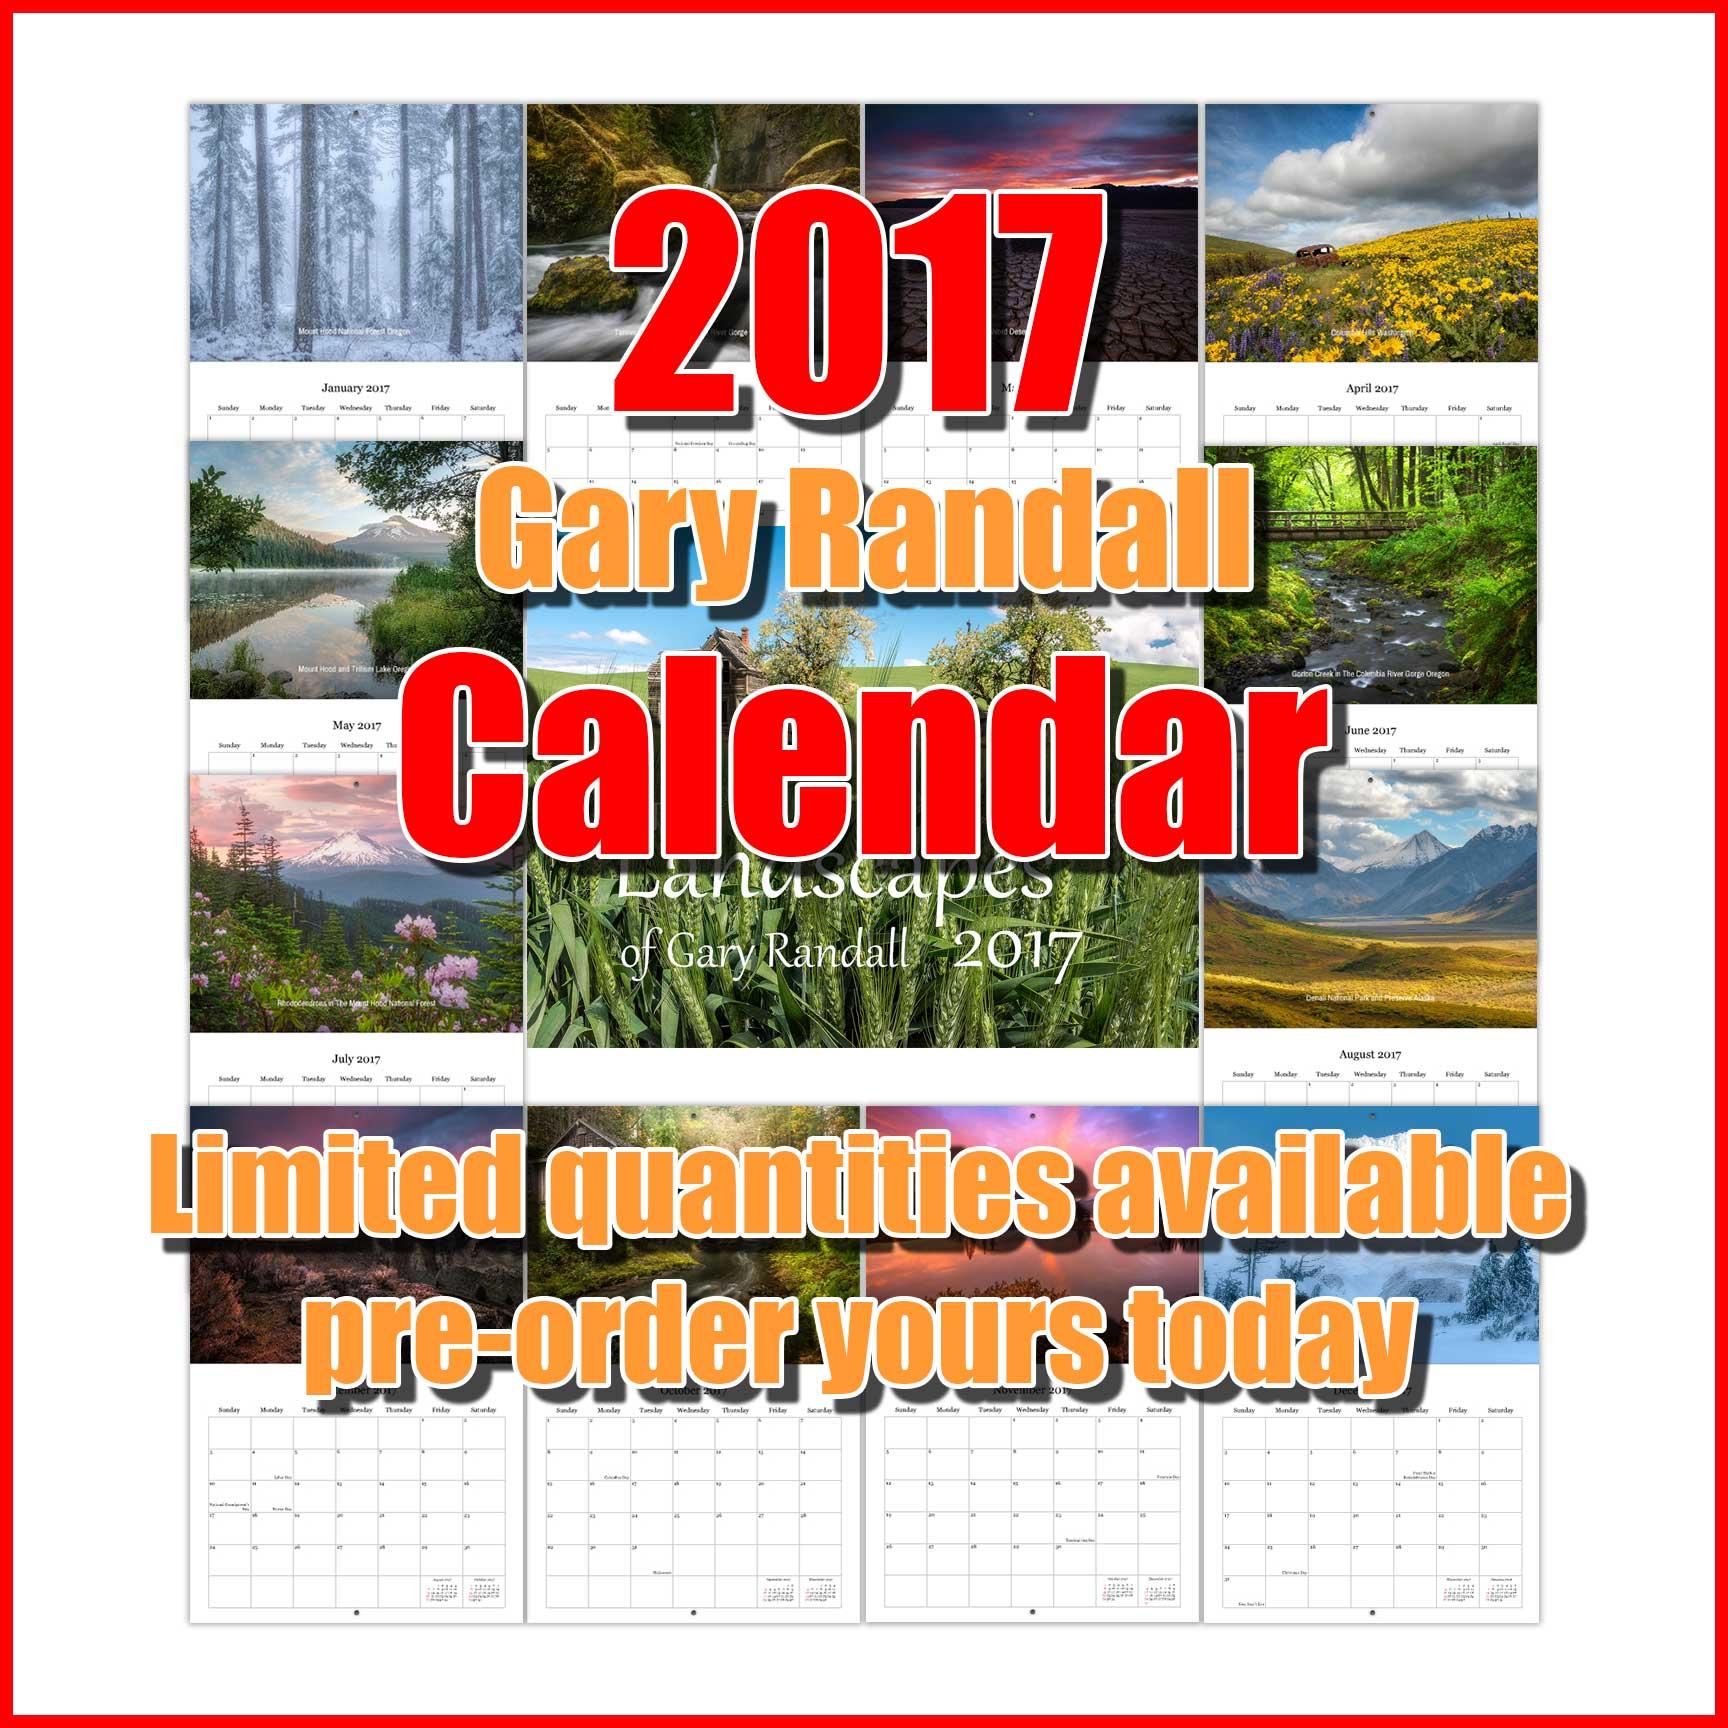 2017 Gary Randall Calendar